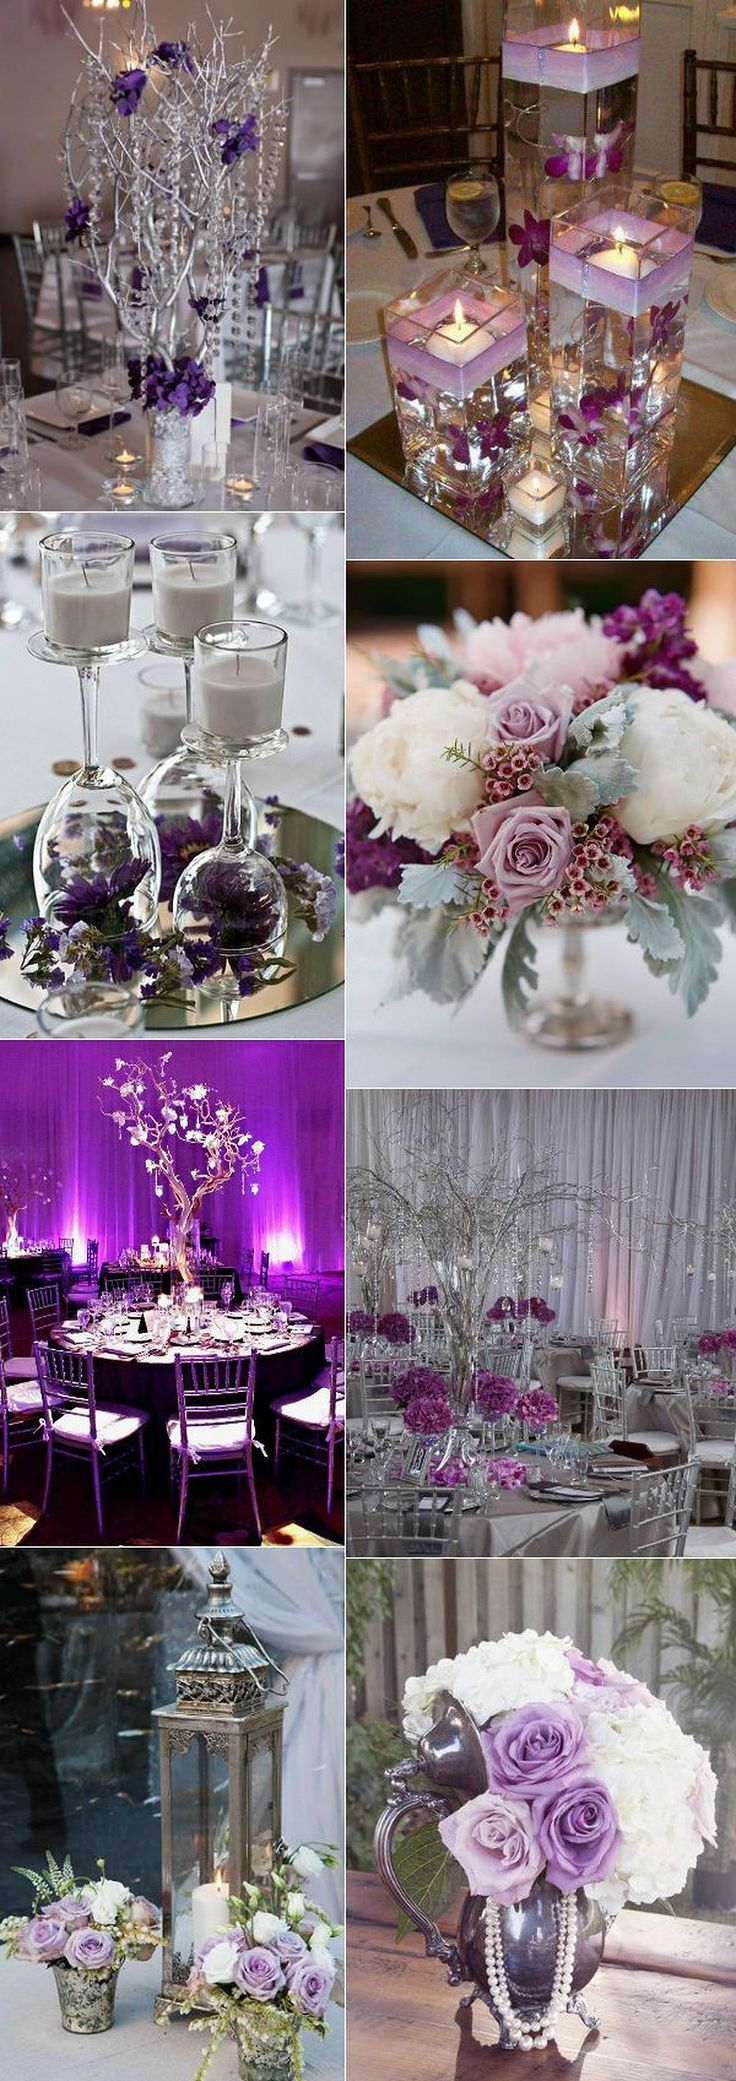 Best 25+ Grey purple wedding ideas on Pinterest | Lavender ...